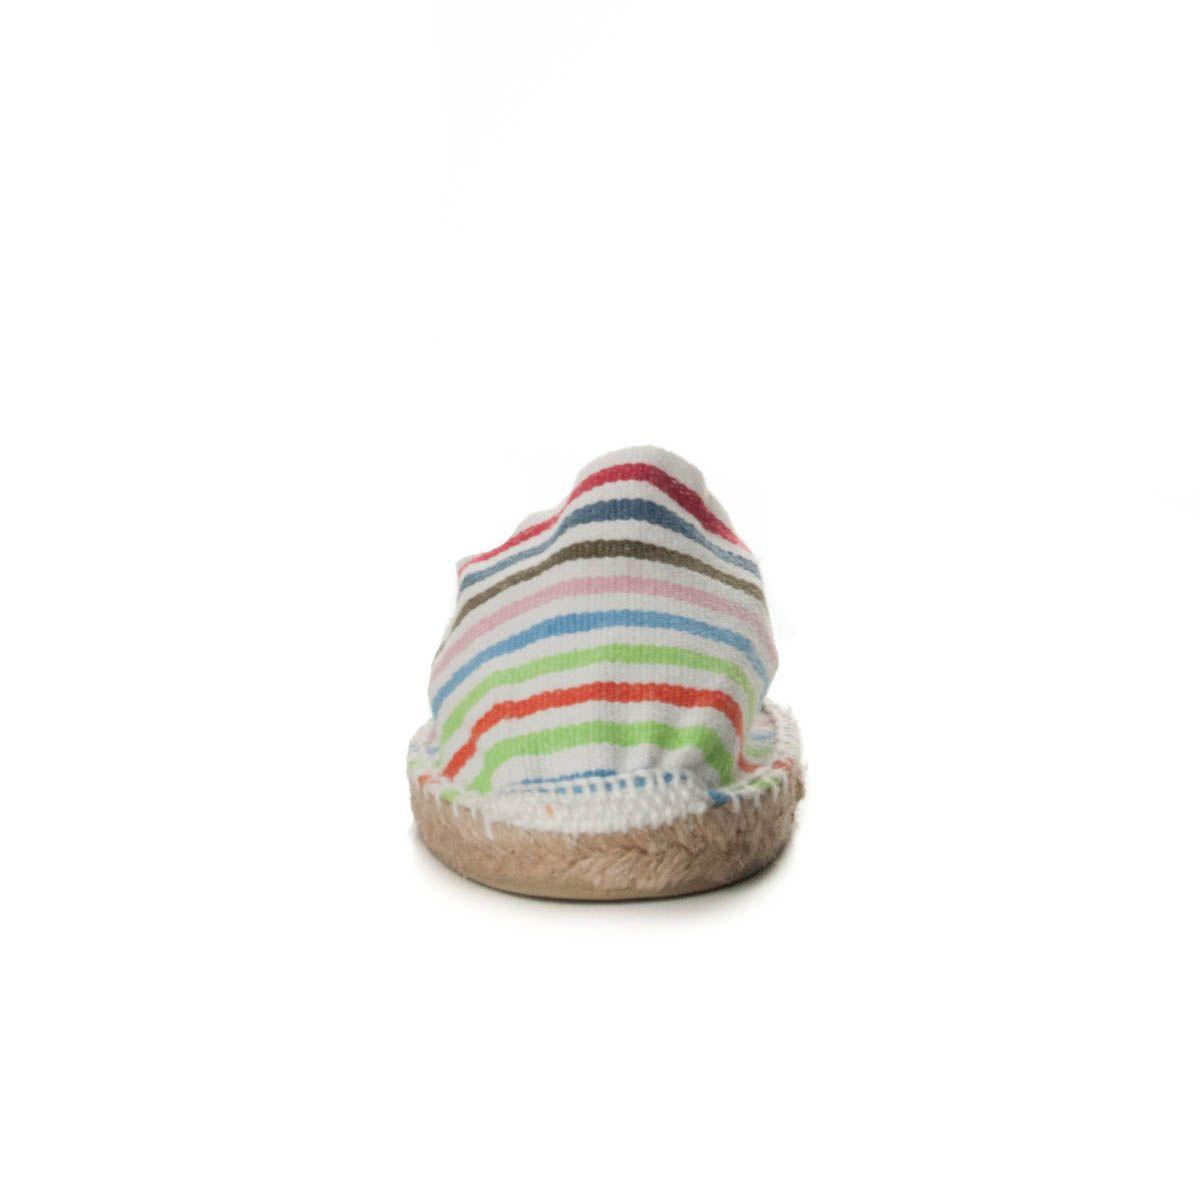 Maria Graor Artisanal Espadrille in Multicolour Stripe